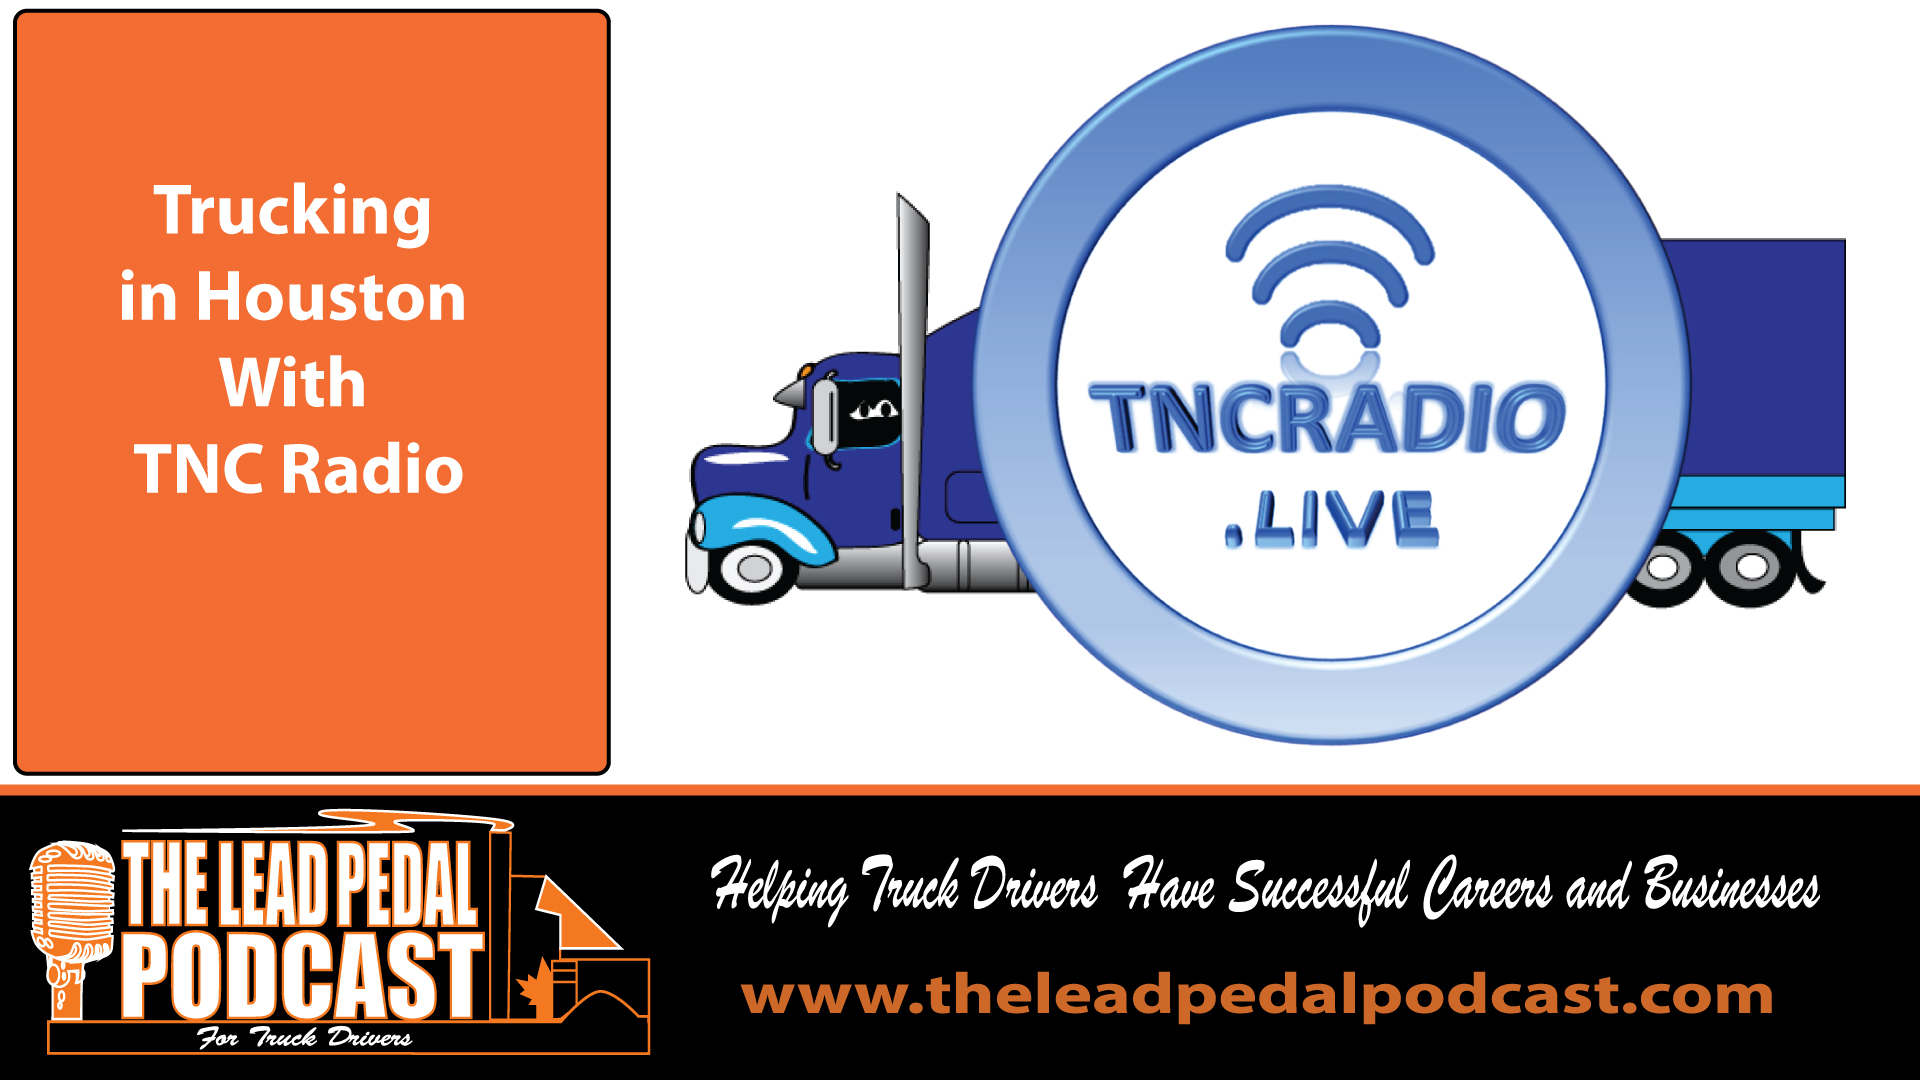 LP619 Trucking in Houston with TNC Radio